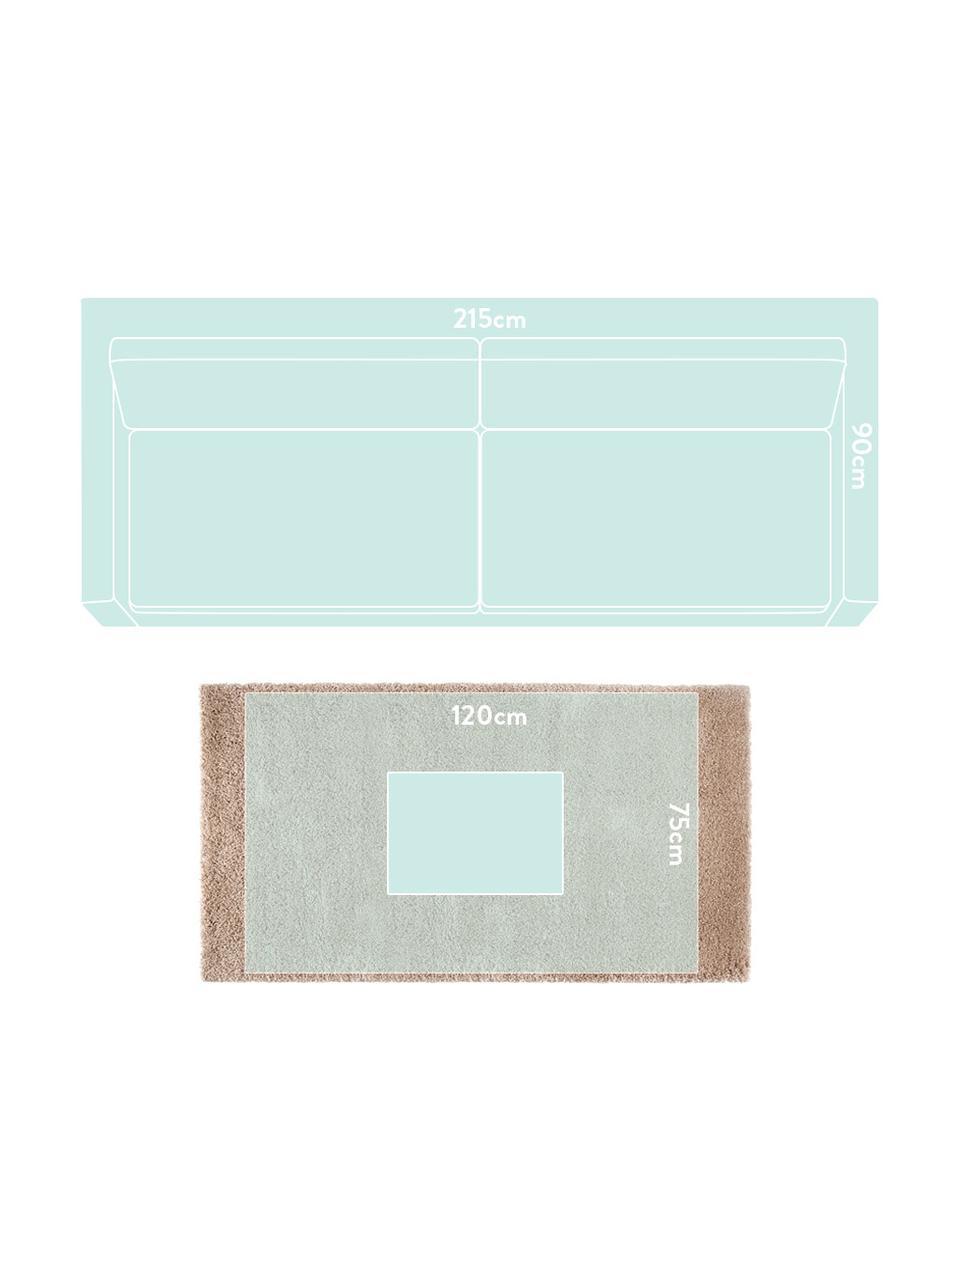 Flauschiger Hochflor-Teppich Venice in Braun, Flor: 100% Polypropylen, Braun, B 80 x L 150 cm (Größe XS)